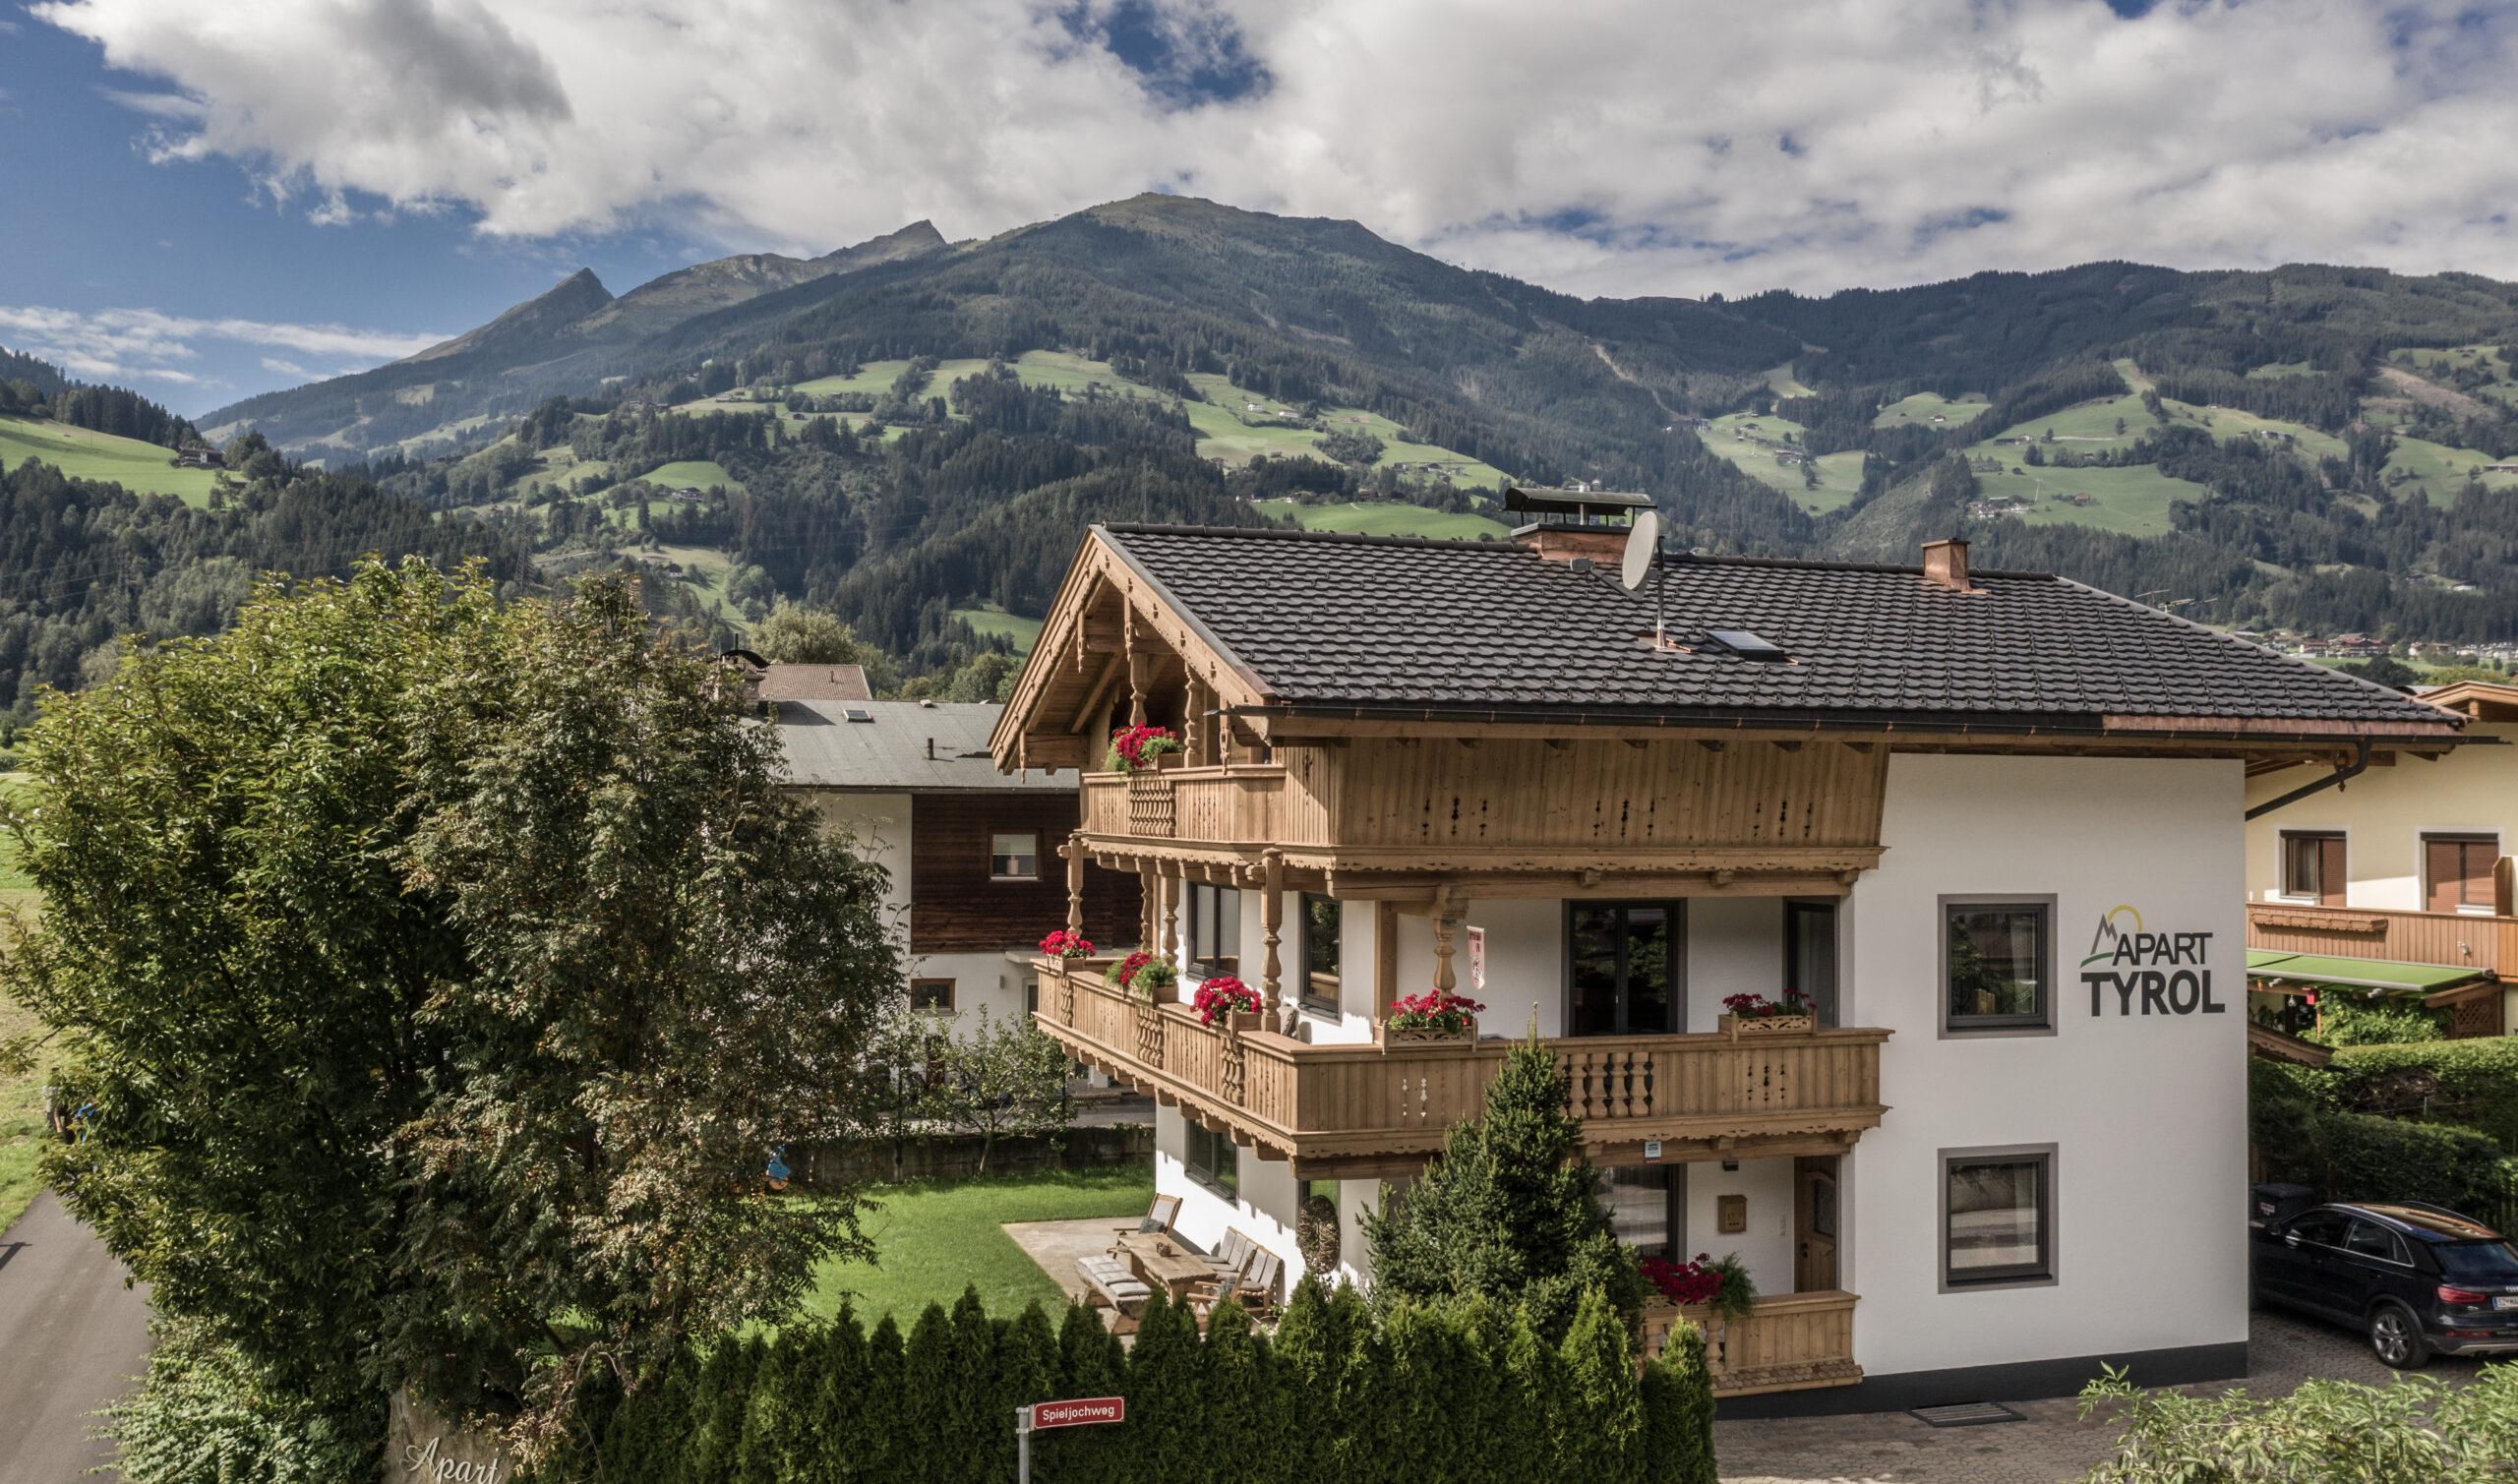 Apart Tyrol im Zillertal Apartments